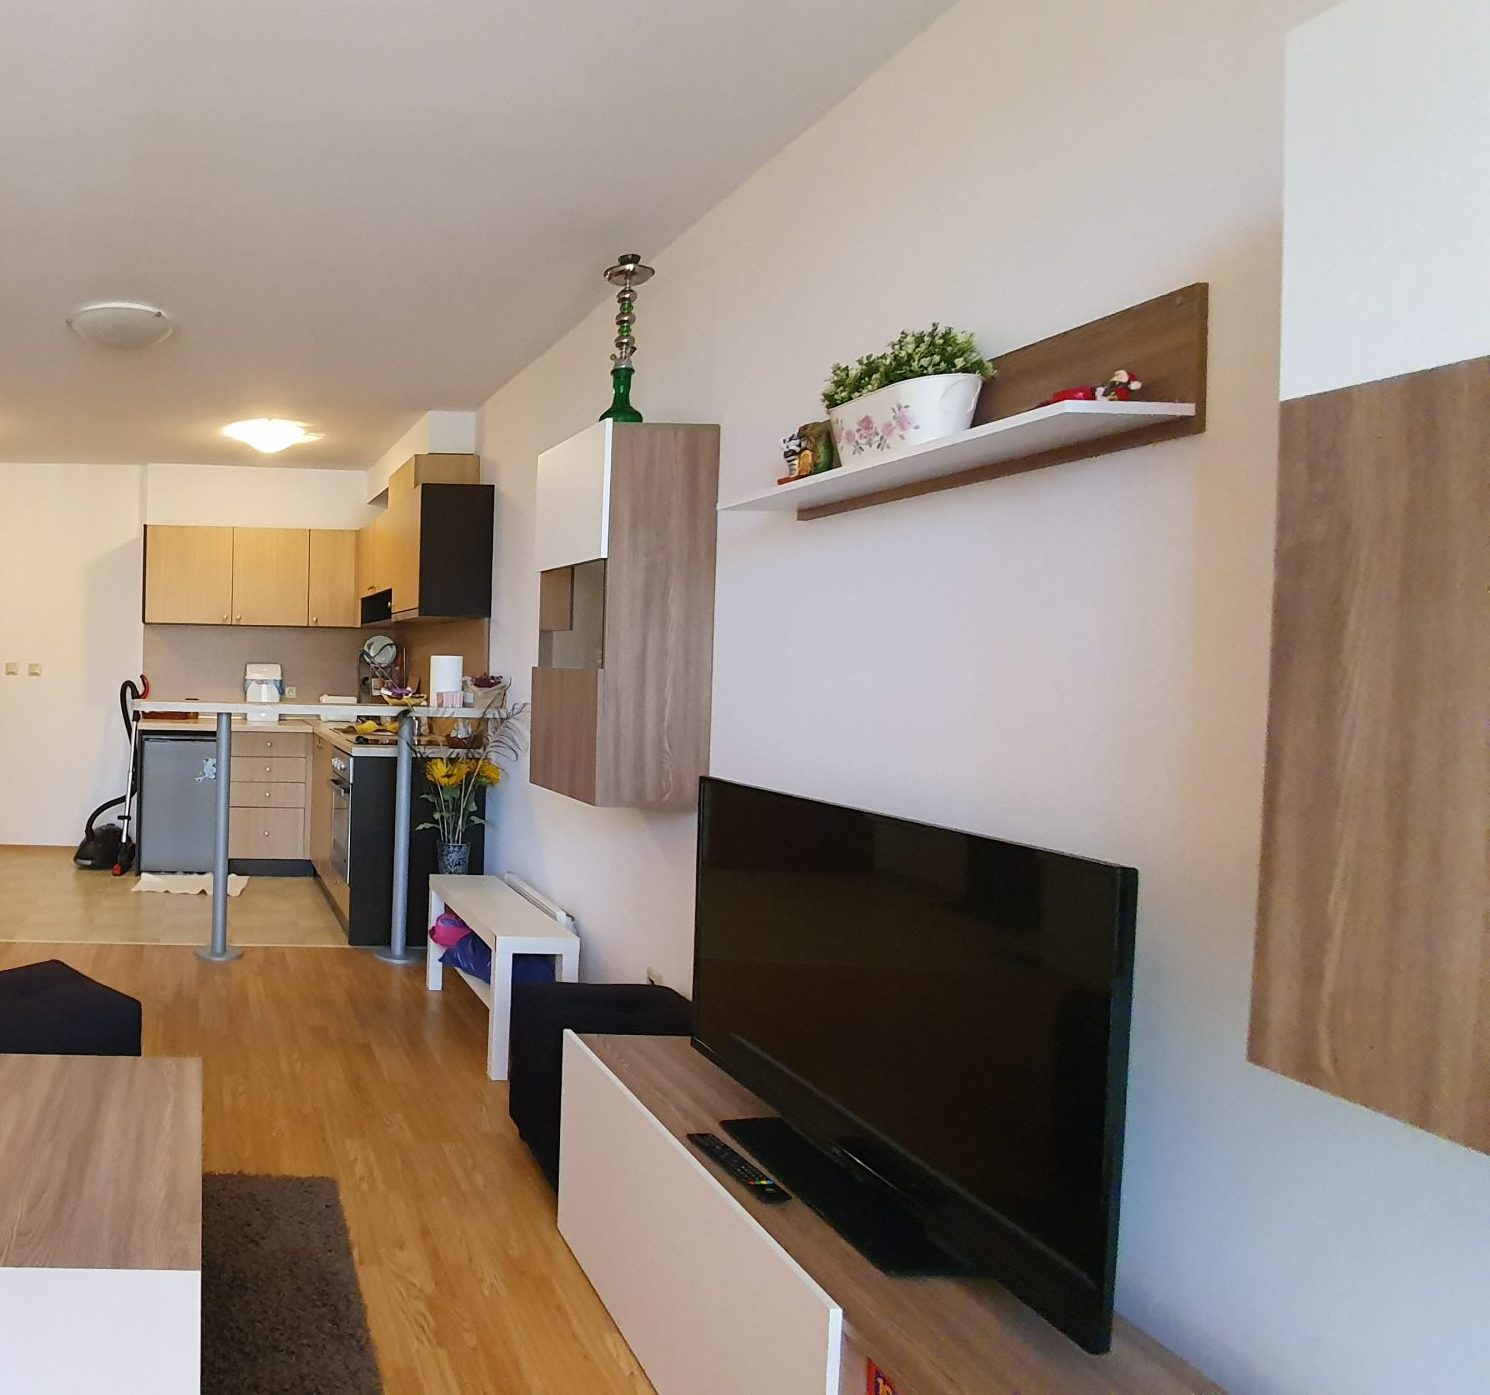 2 bedroom apartment in Aspen Heights near Bansko